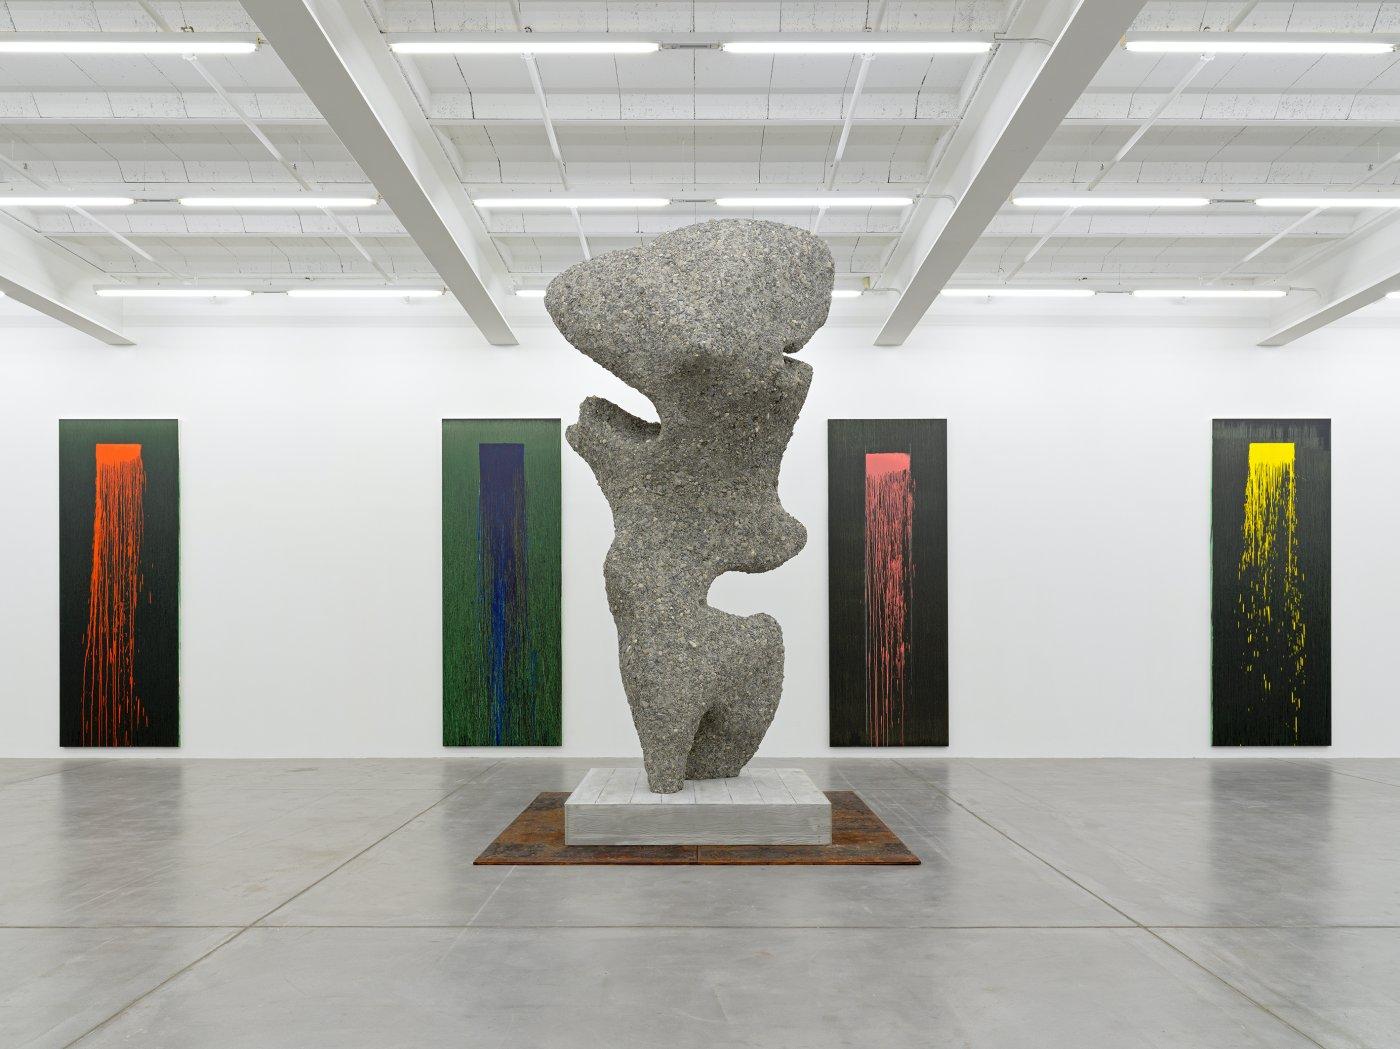 Galerie Eva Presenhuber Pat Steir Ugo Rondinone 5